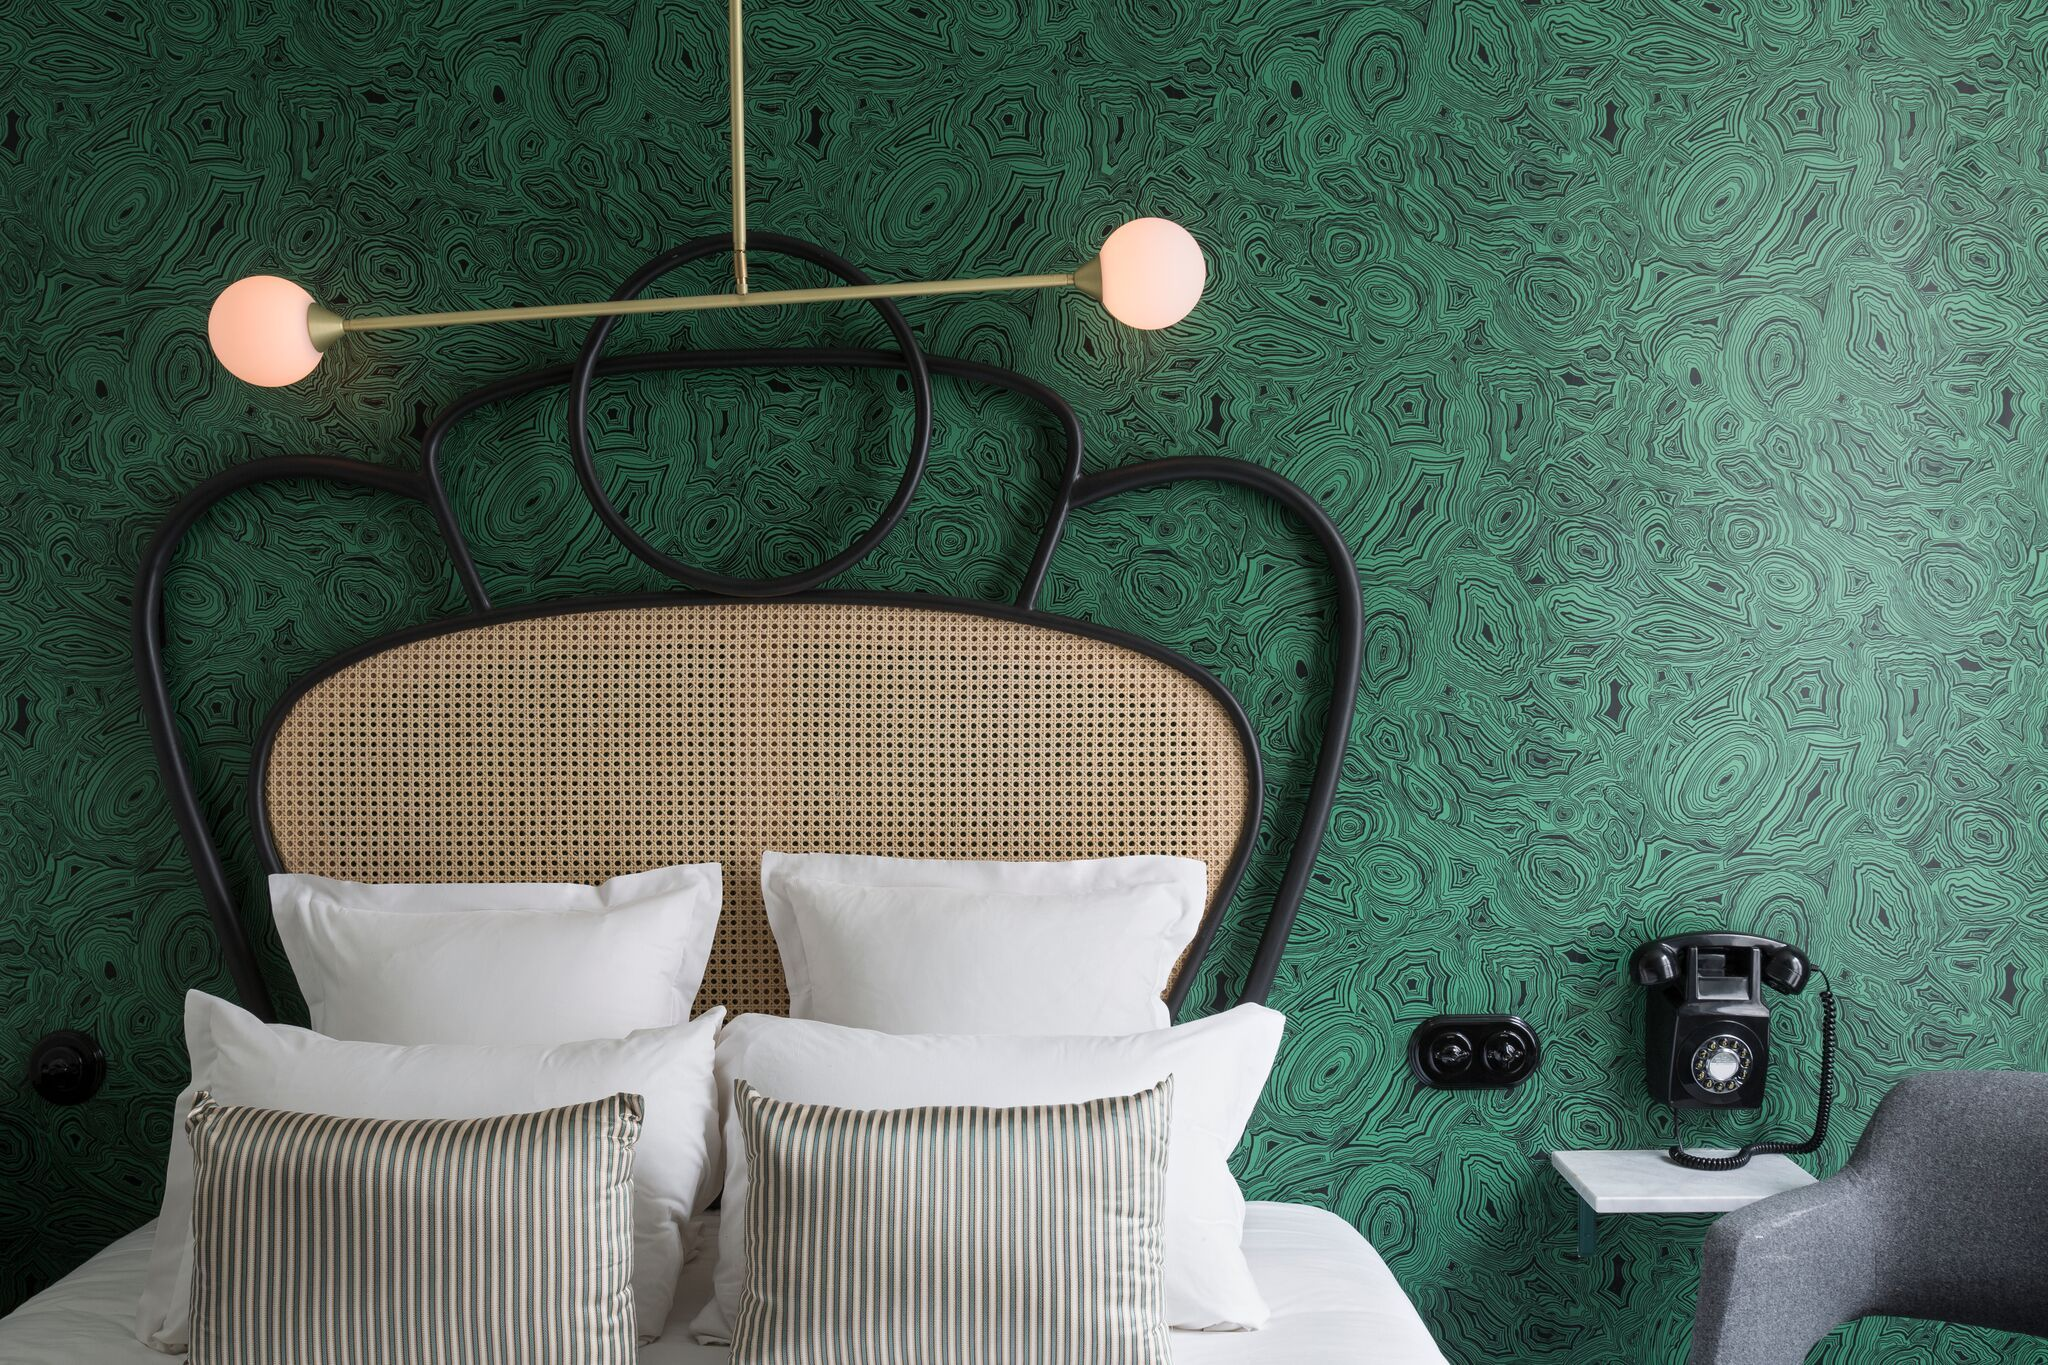 Hotel Panache An Affordable Design Hotel In Paris Hotel